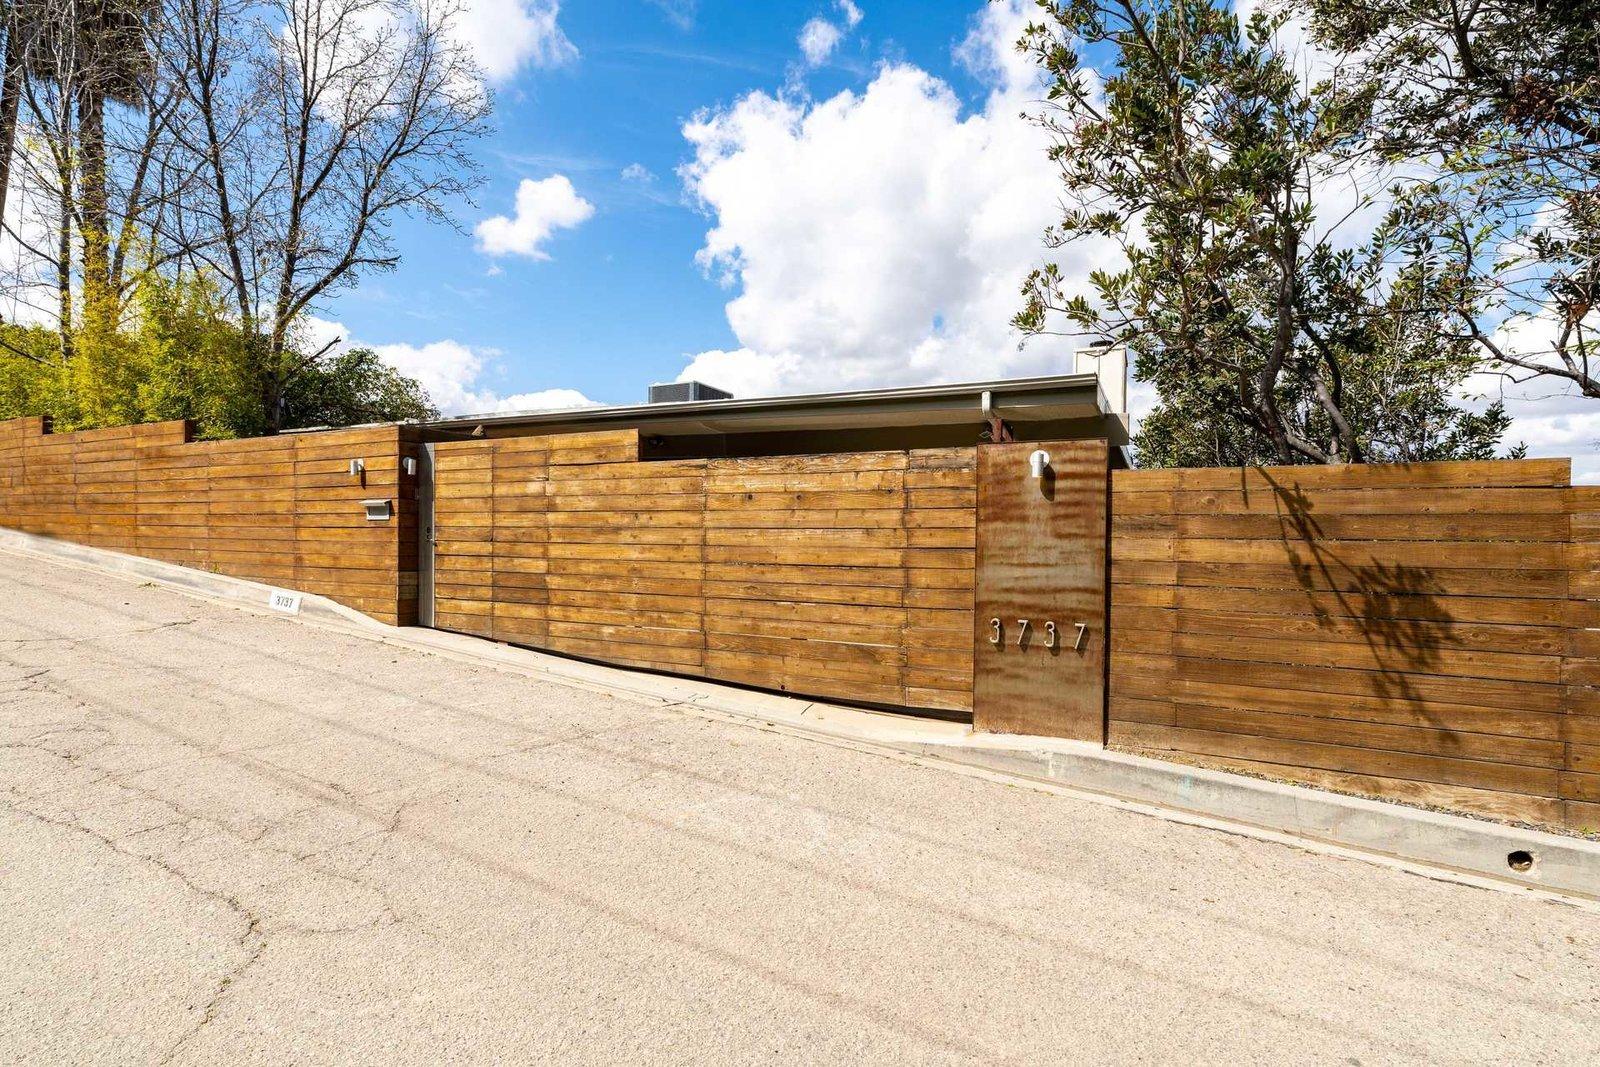 Richard Neutra Platform House privacy fence